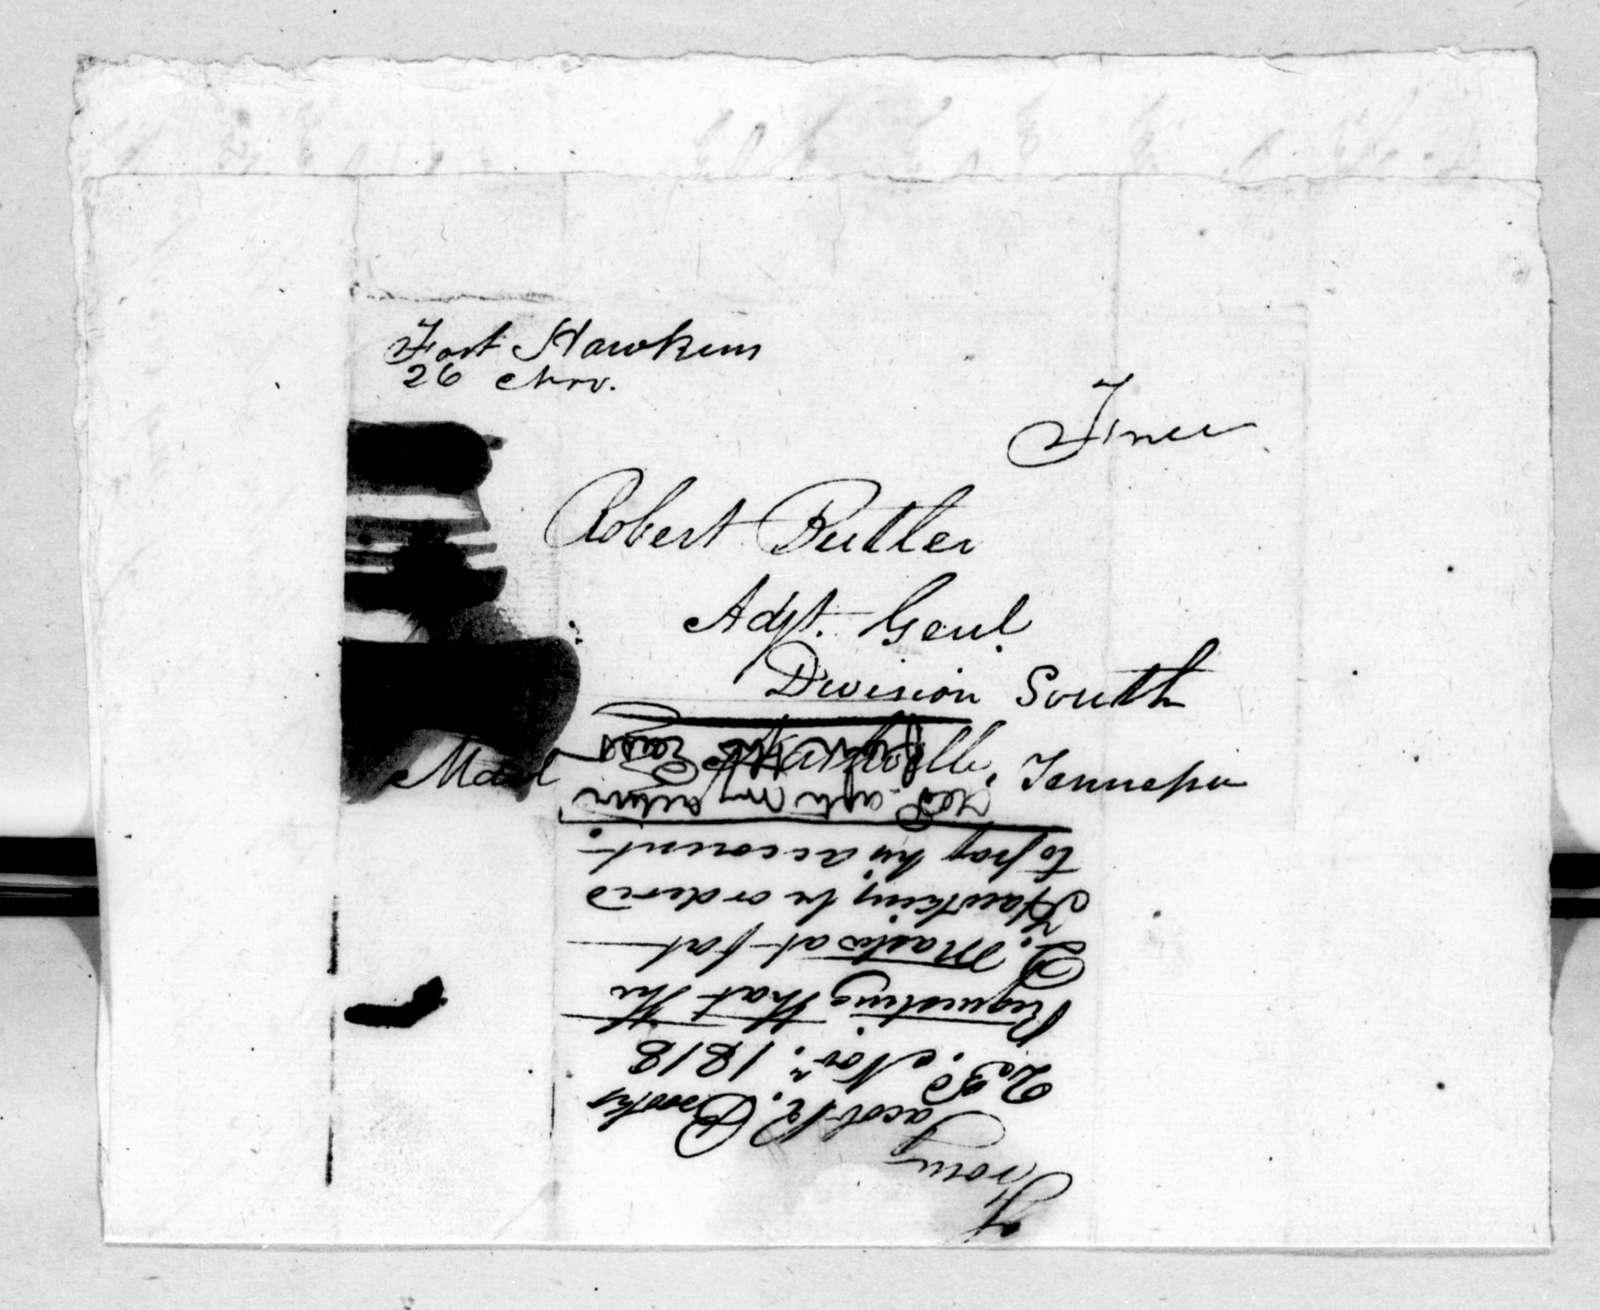 Jacob R. Brooks to Robert Butler, November 23, 1818